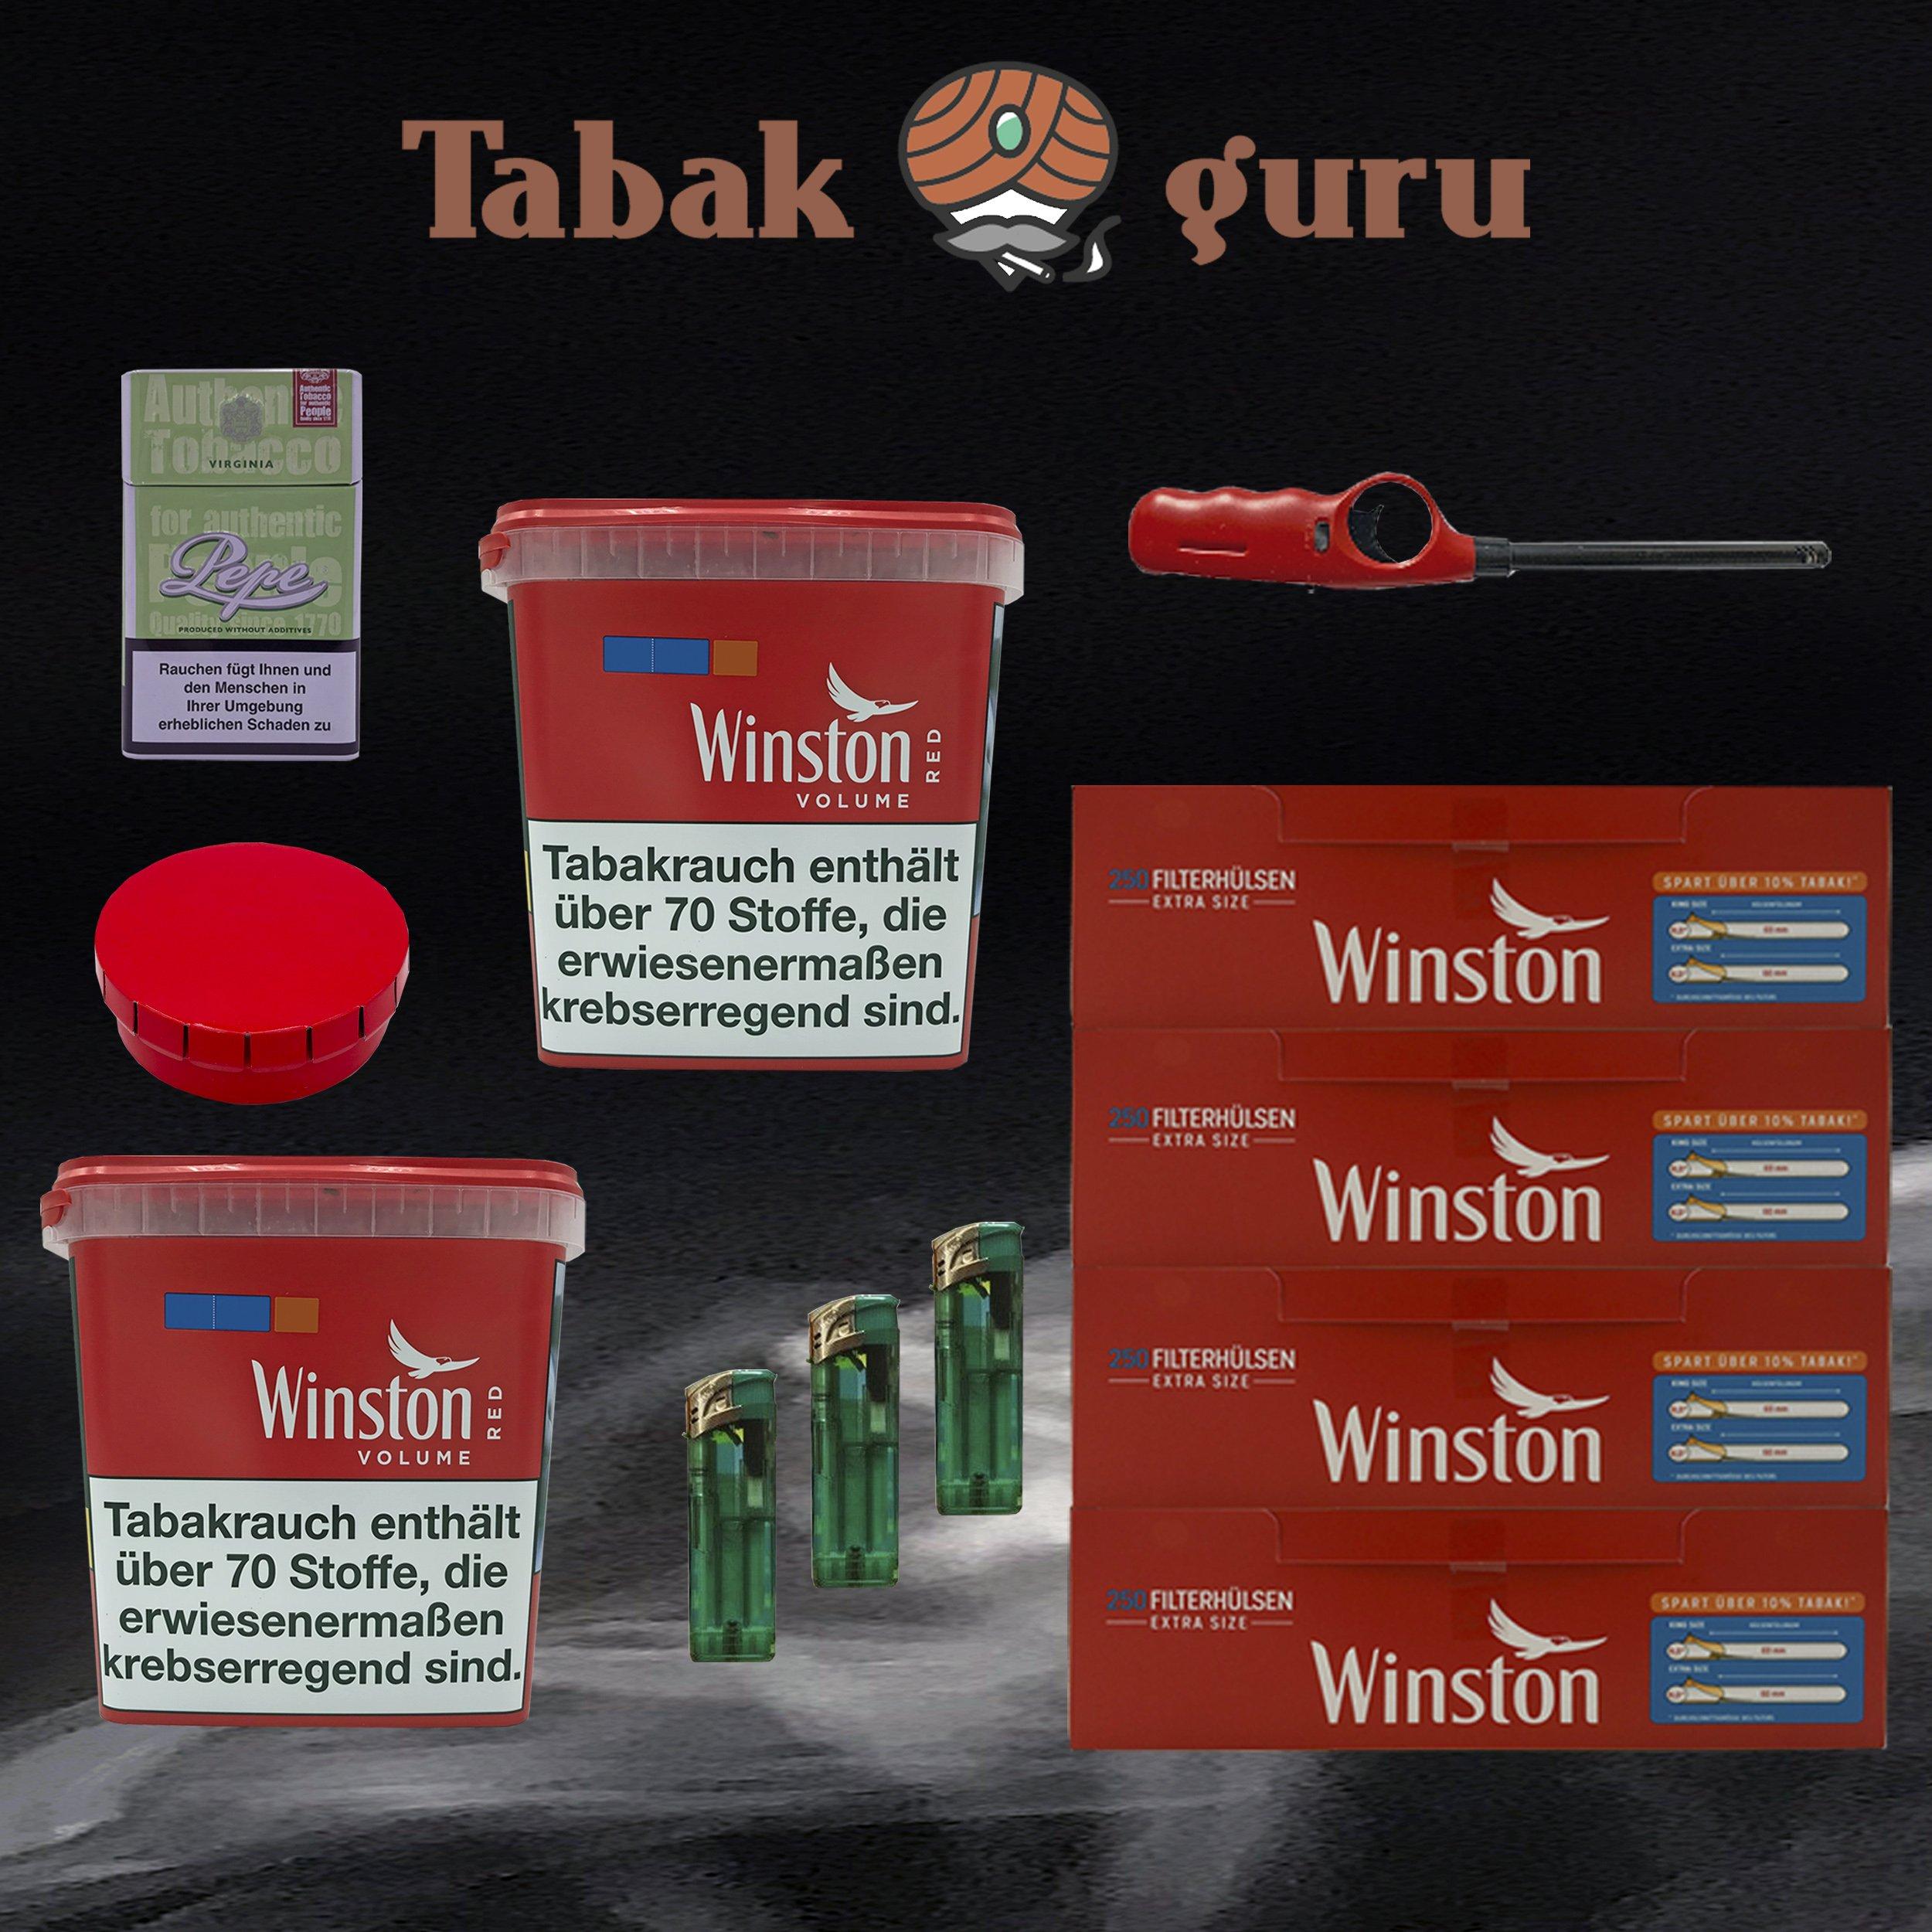 2x Winston Red/Rot Giant Box 315g Volumentabak, Extra Hülsen, + Zubehör